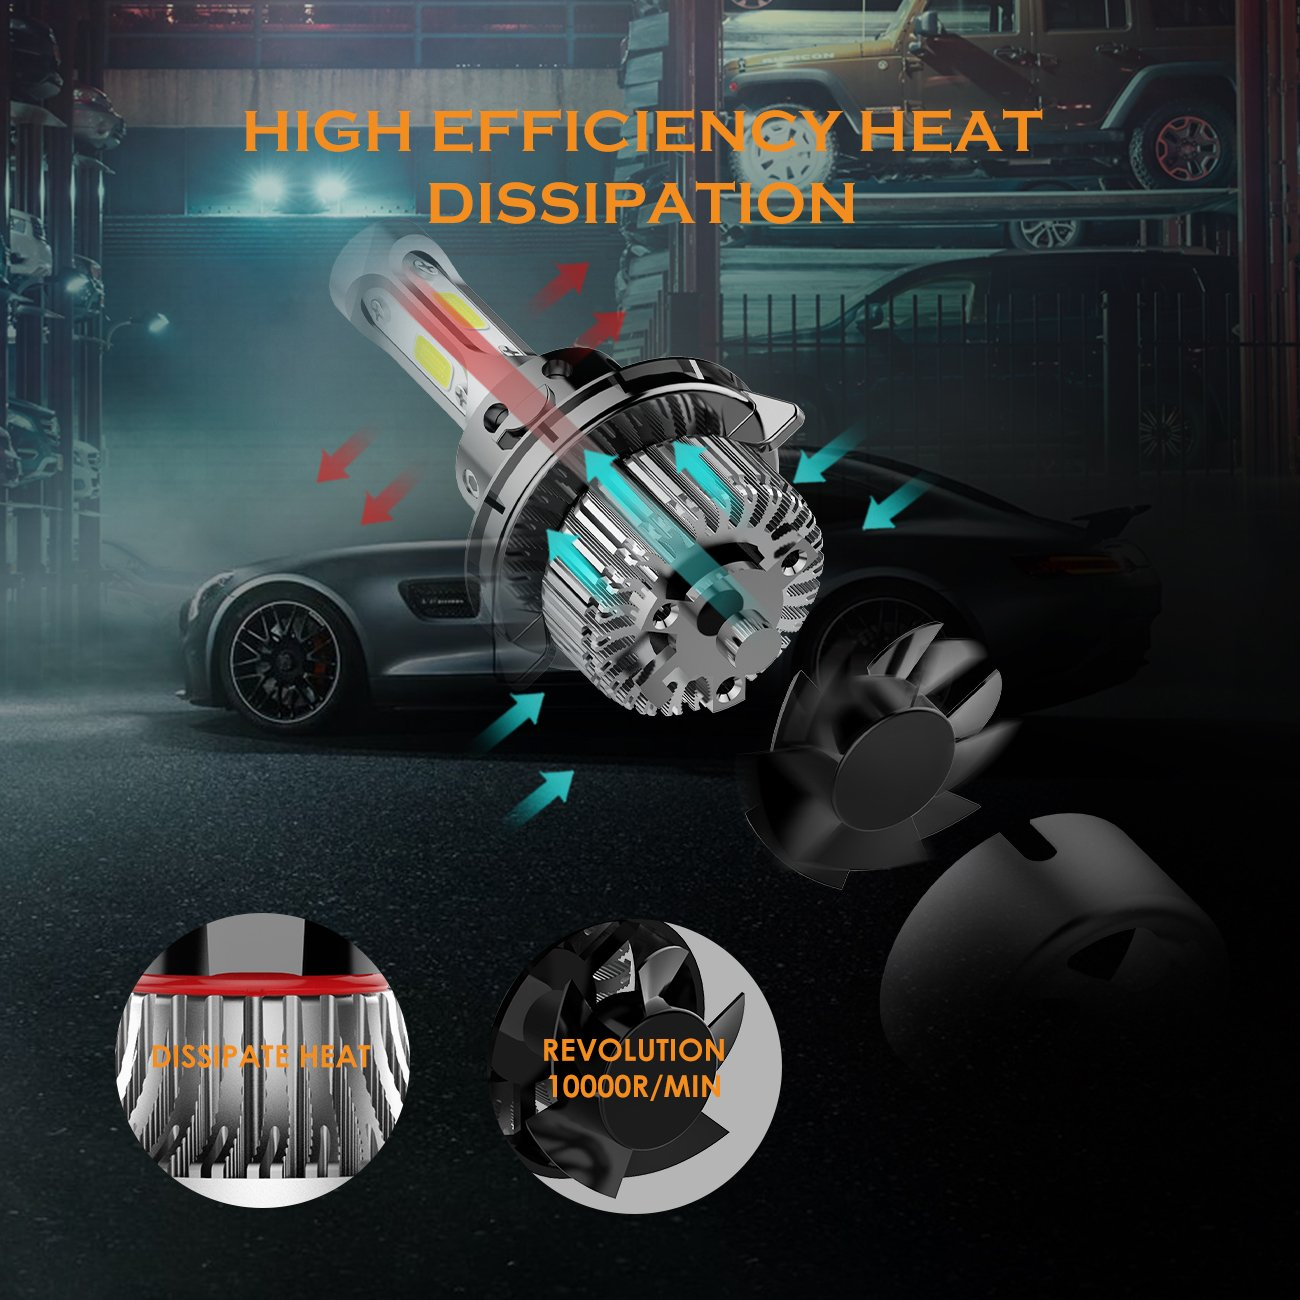 Auxbeam LED Headlights F-S2 Series H1 P145S Headlight Bulbs High Brightness H1 P145S Headlight Conversion Kit with 2 Pcs of H1 Bulbs 72W 8000lm COB Led Chips Single Beam 1 Year Warranty